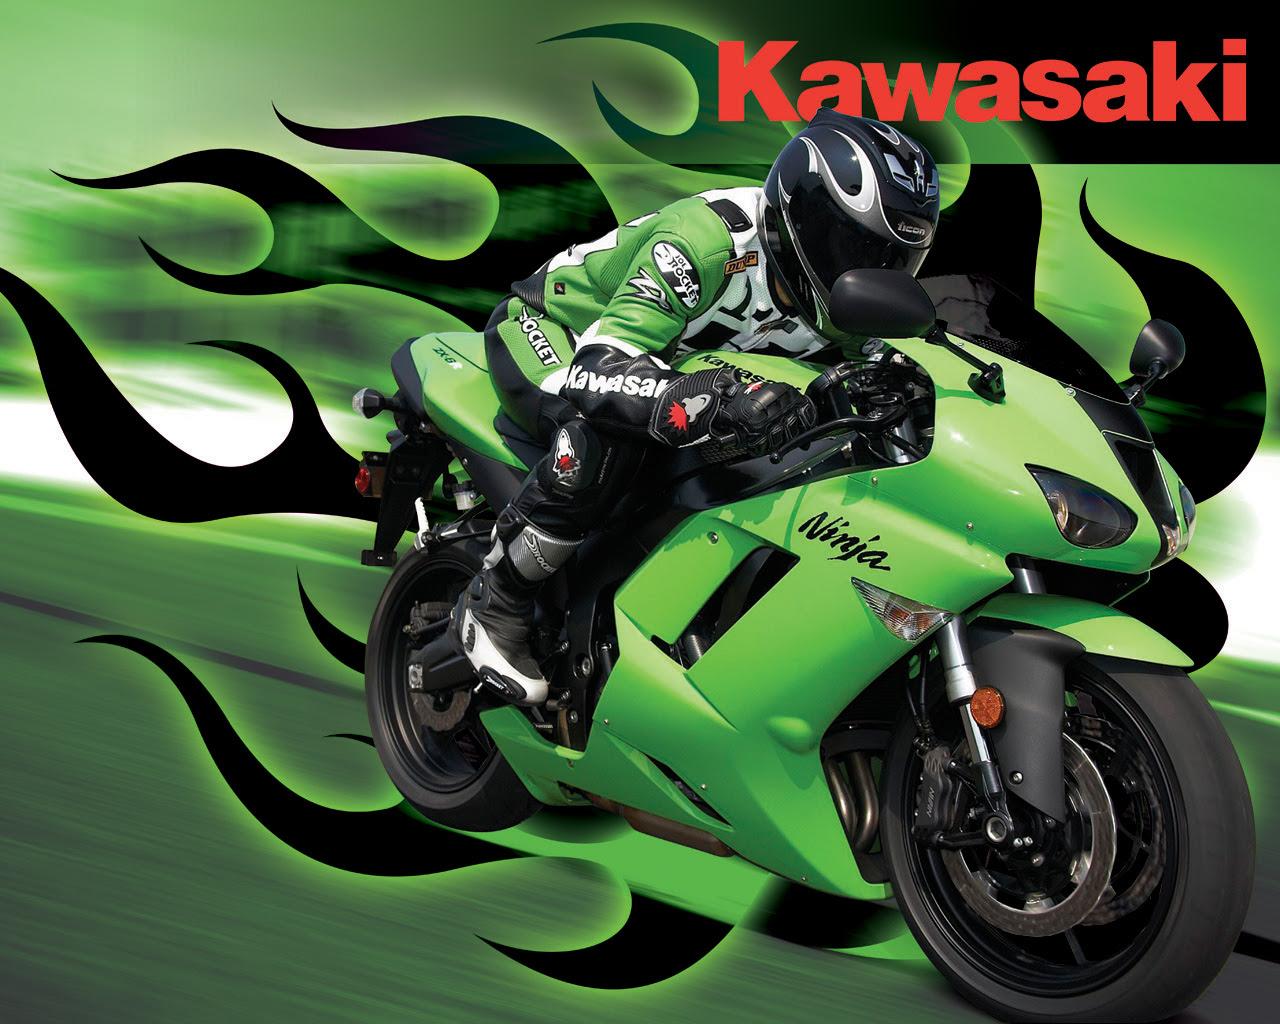 99 Gambar Motor Kawasaki Ninja Keren Terlengkap Gubuk Modifikasi